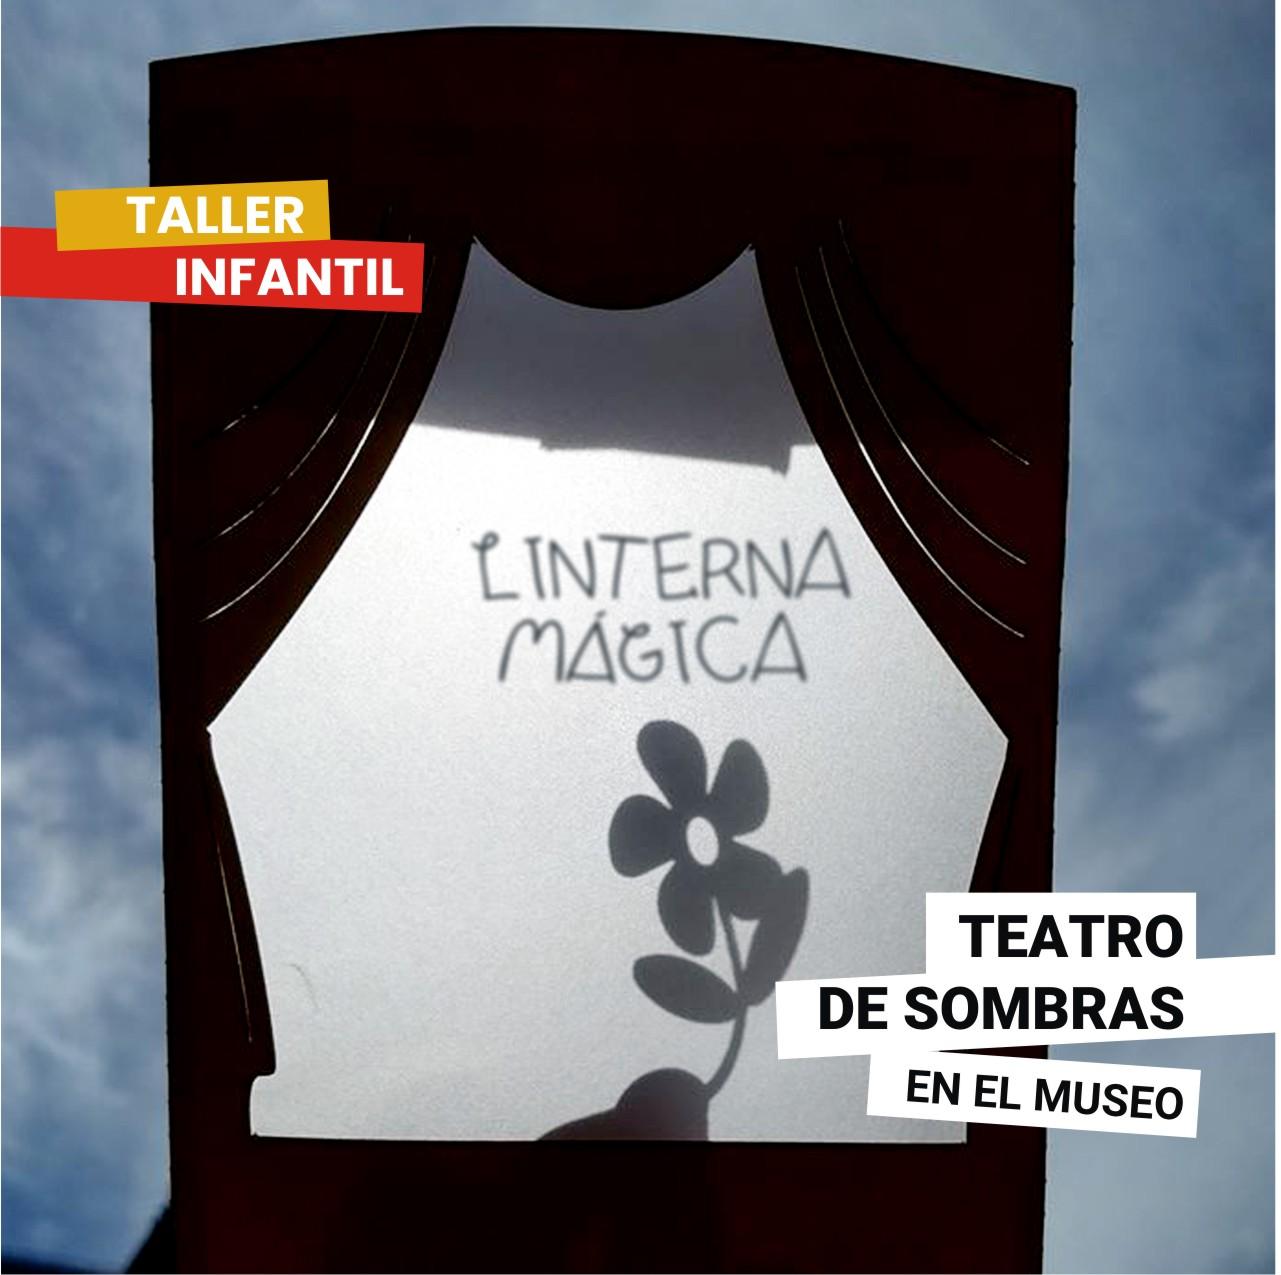 "Taller Infantil ""Linterna mágica"". Sábado 12 de octubre. 16 hs."